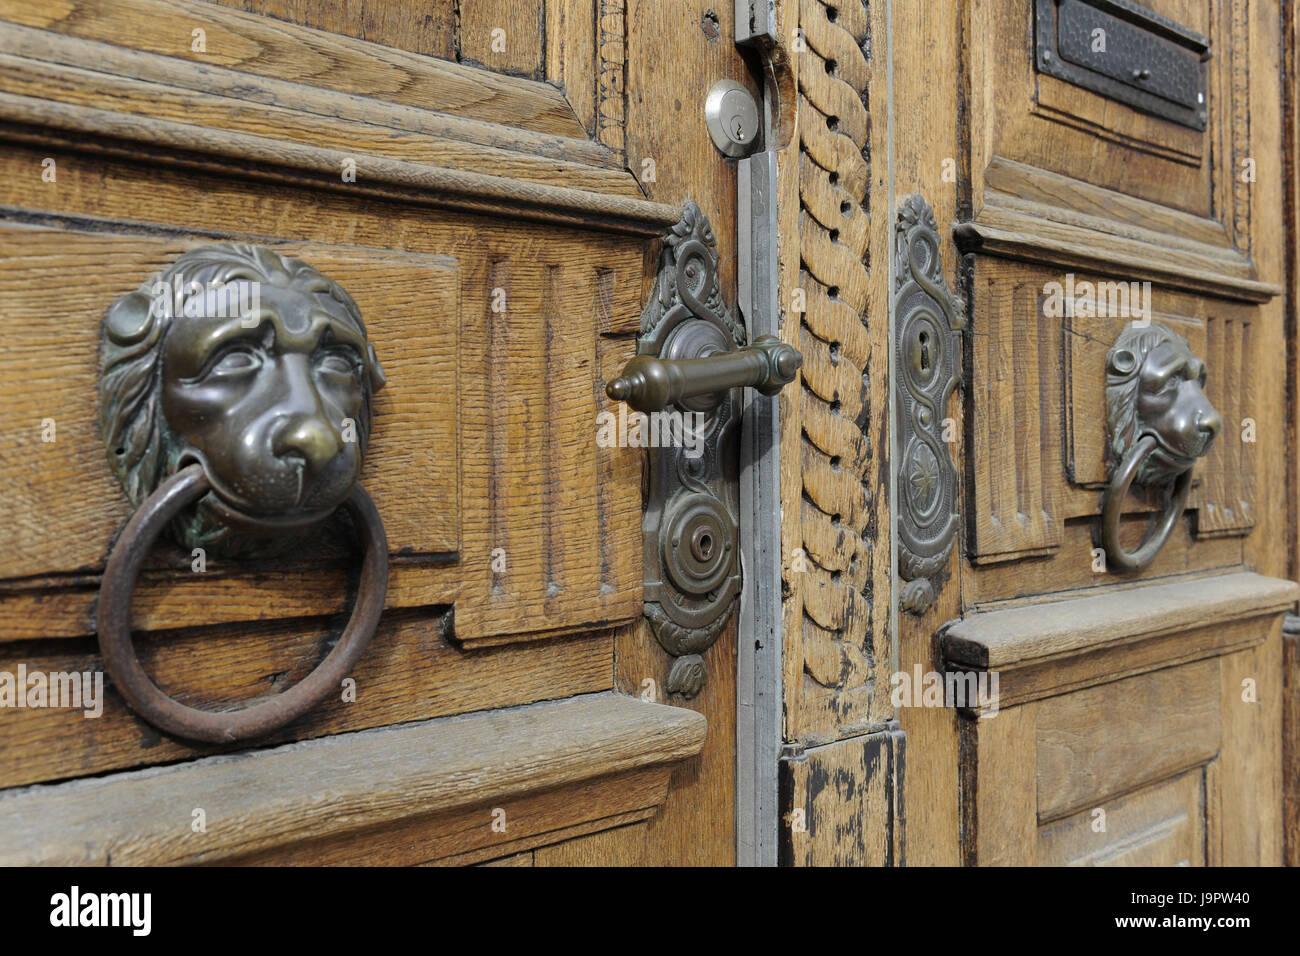 wooden door,metal fittings,historically,detail, Stock Photo